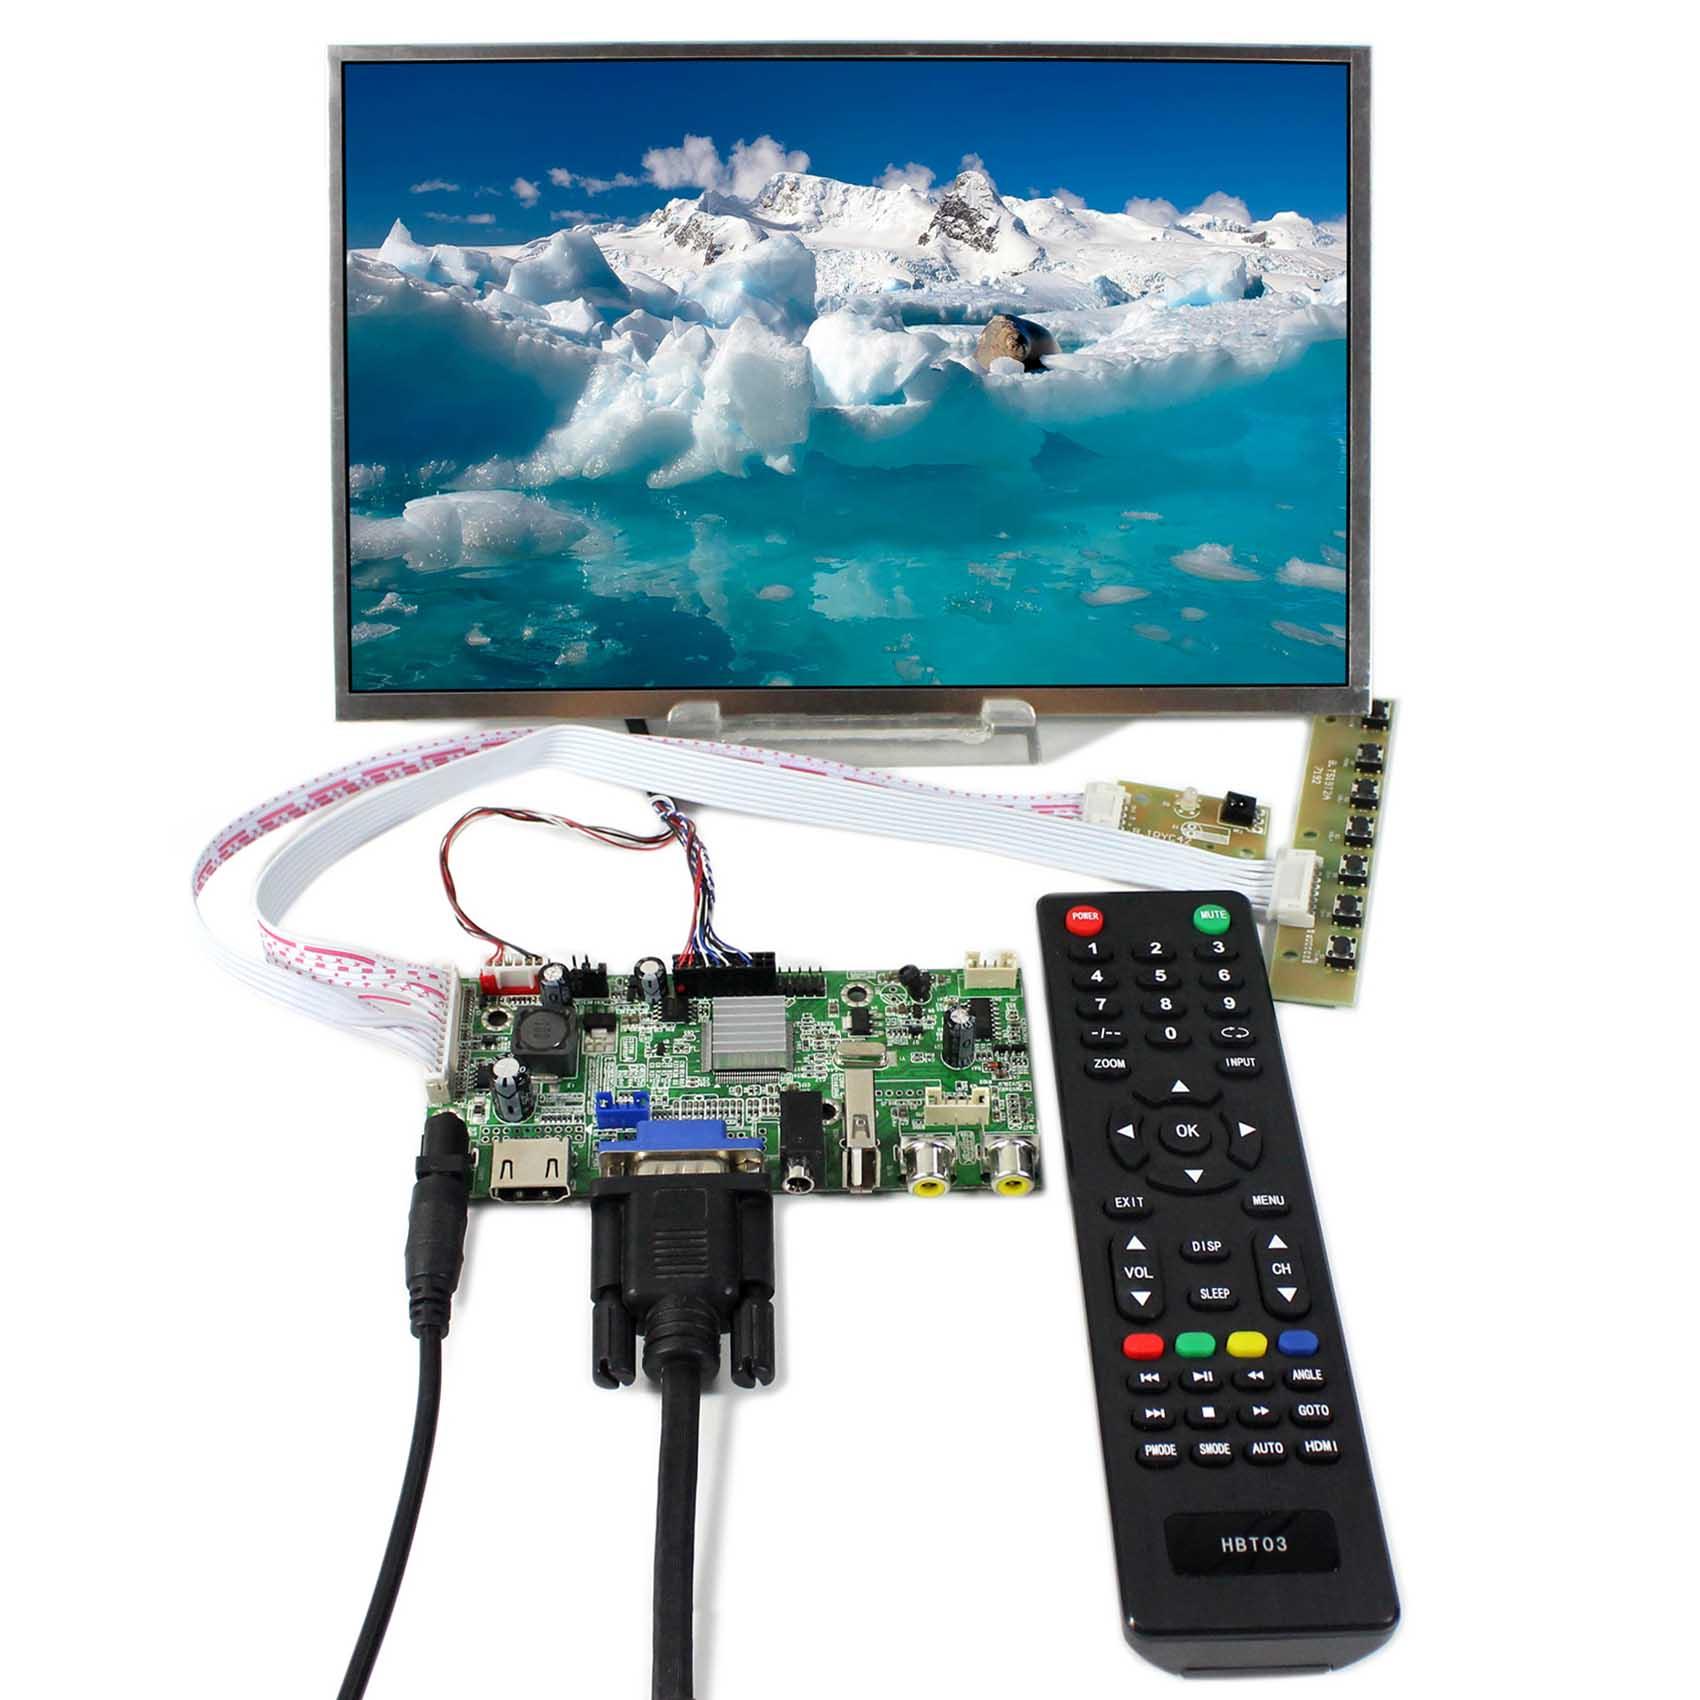 10.1inch LP101WX1 B101EW05 1280x800 LCD Screen With HDMI VGA AV Audio USB LCD Controller Board VS-V59AV-V1 tv hdmi vga av usb audio lcd controller board 10 1inch b101ew05 1280 800 lcd hsd101pww1